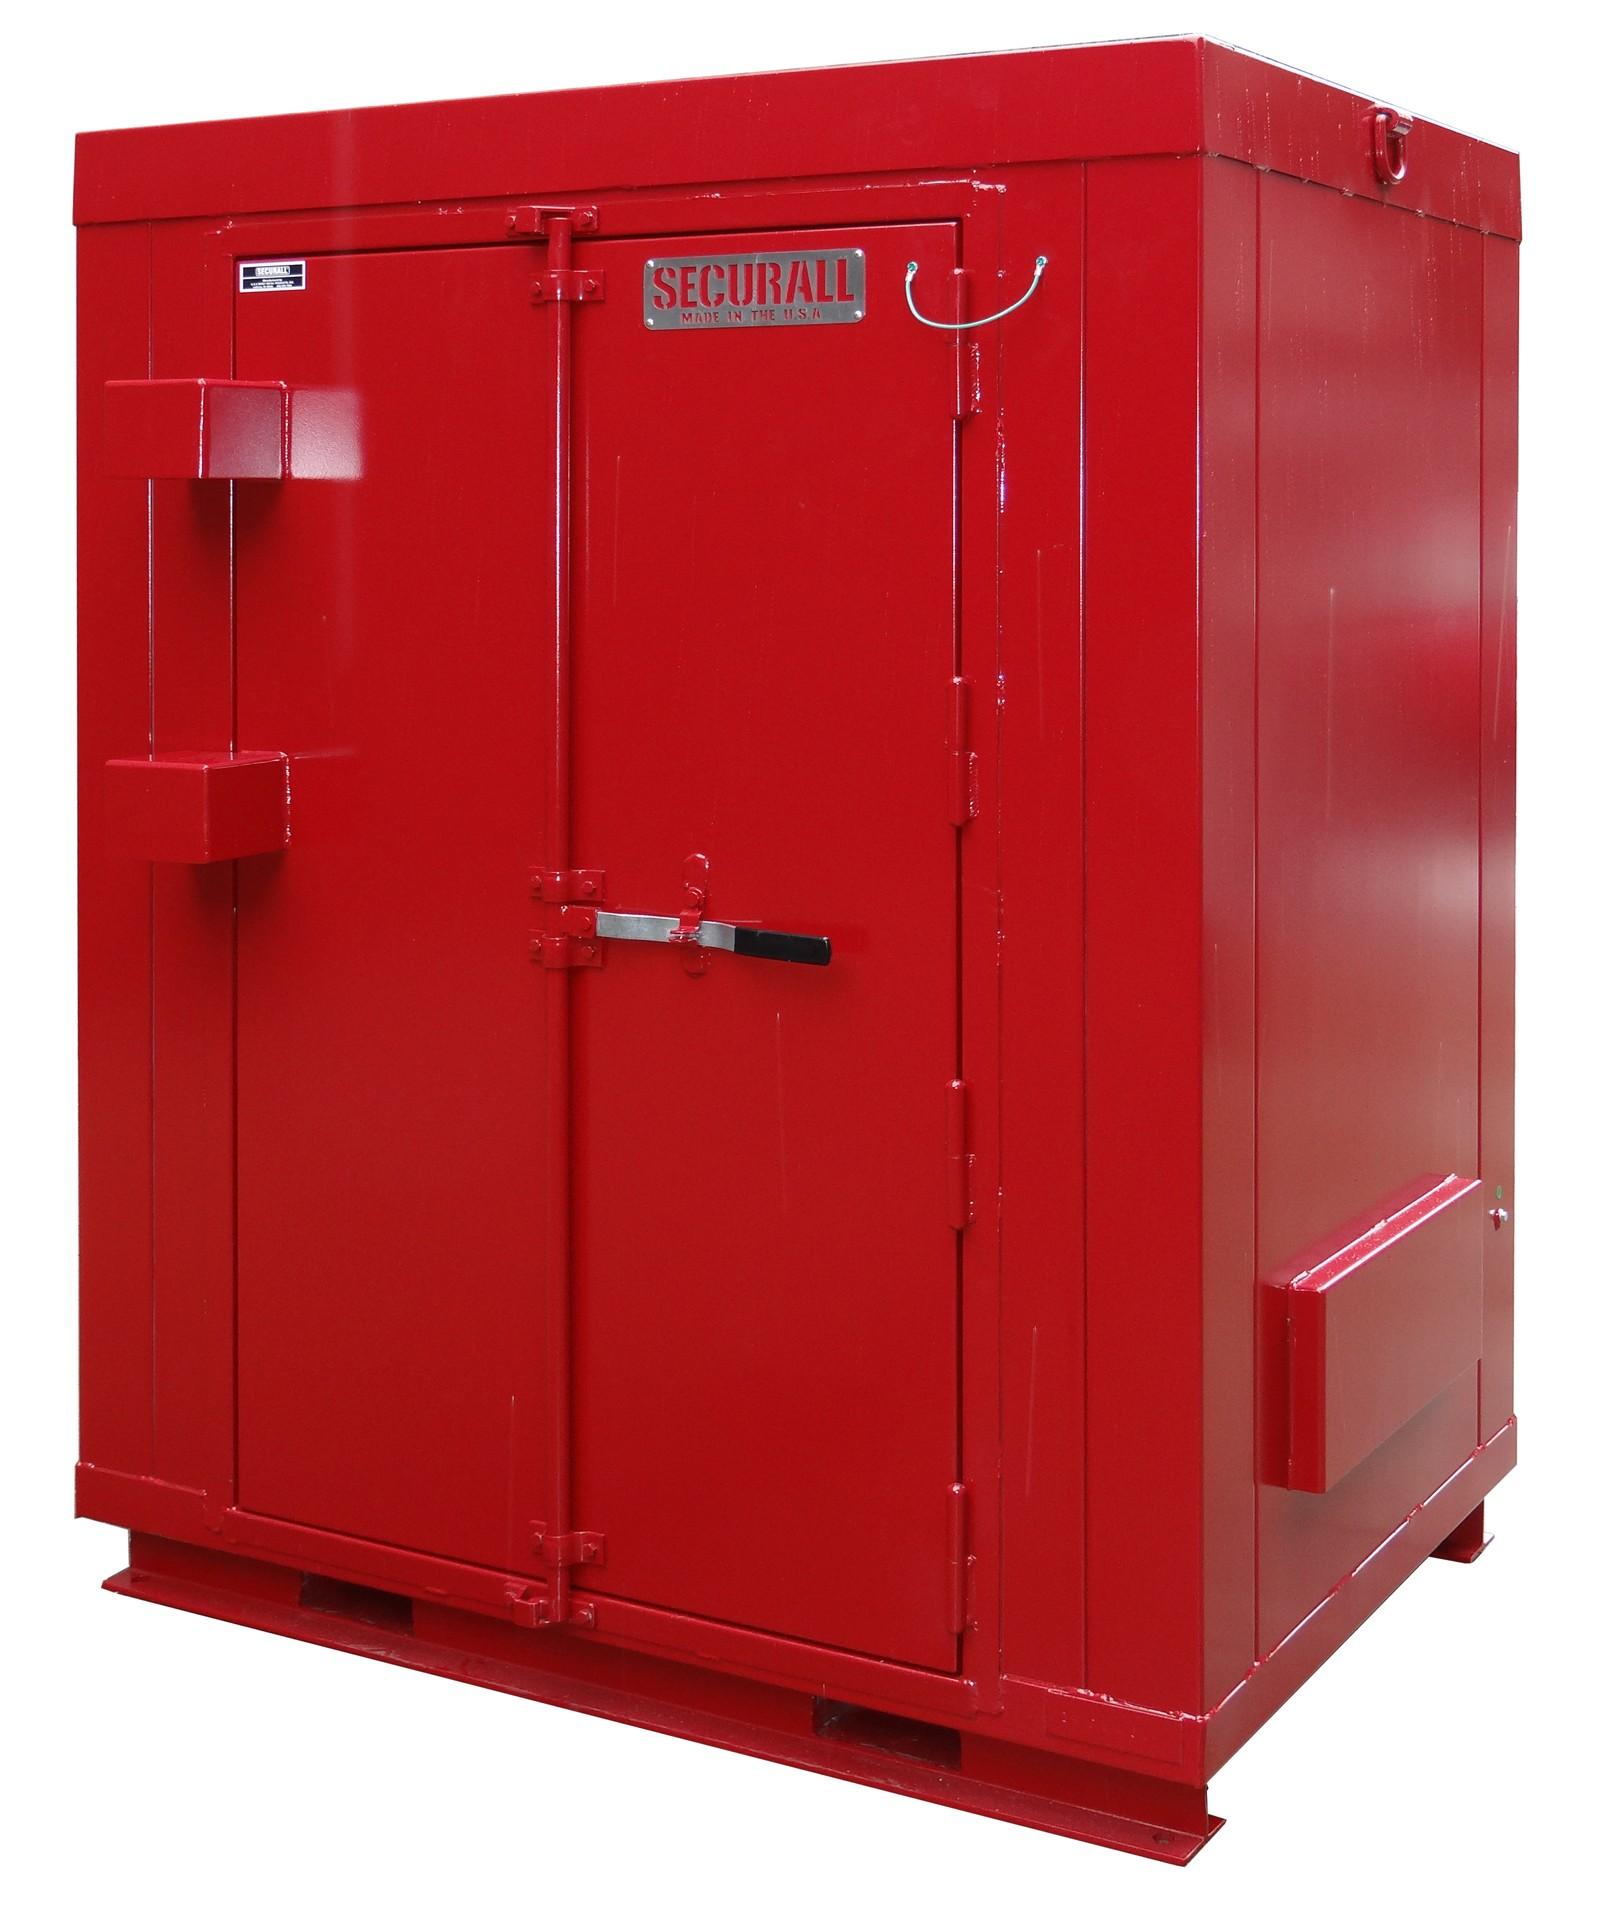 M180 Type 4 Explosive Storage Magazine for Indoor/Outdoor Storage